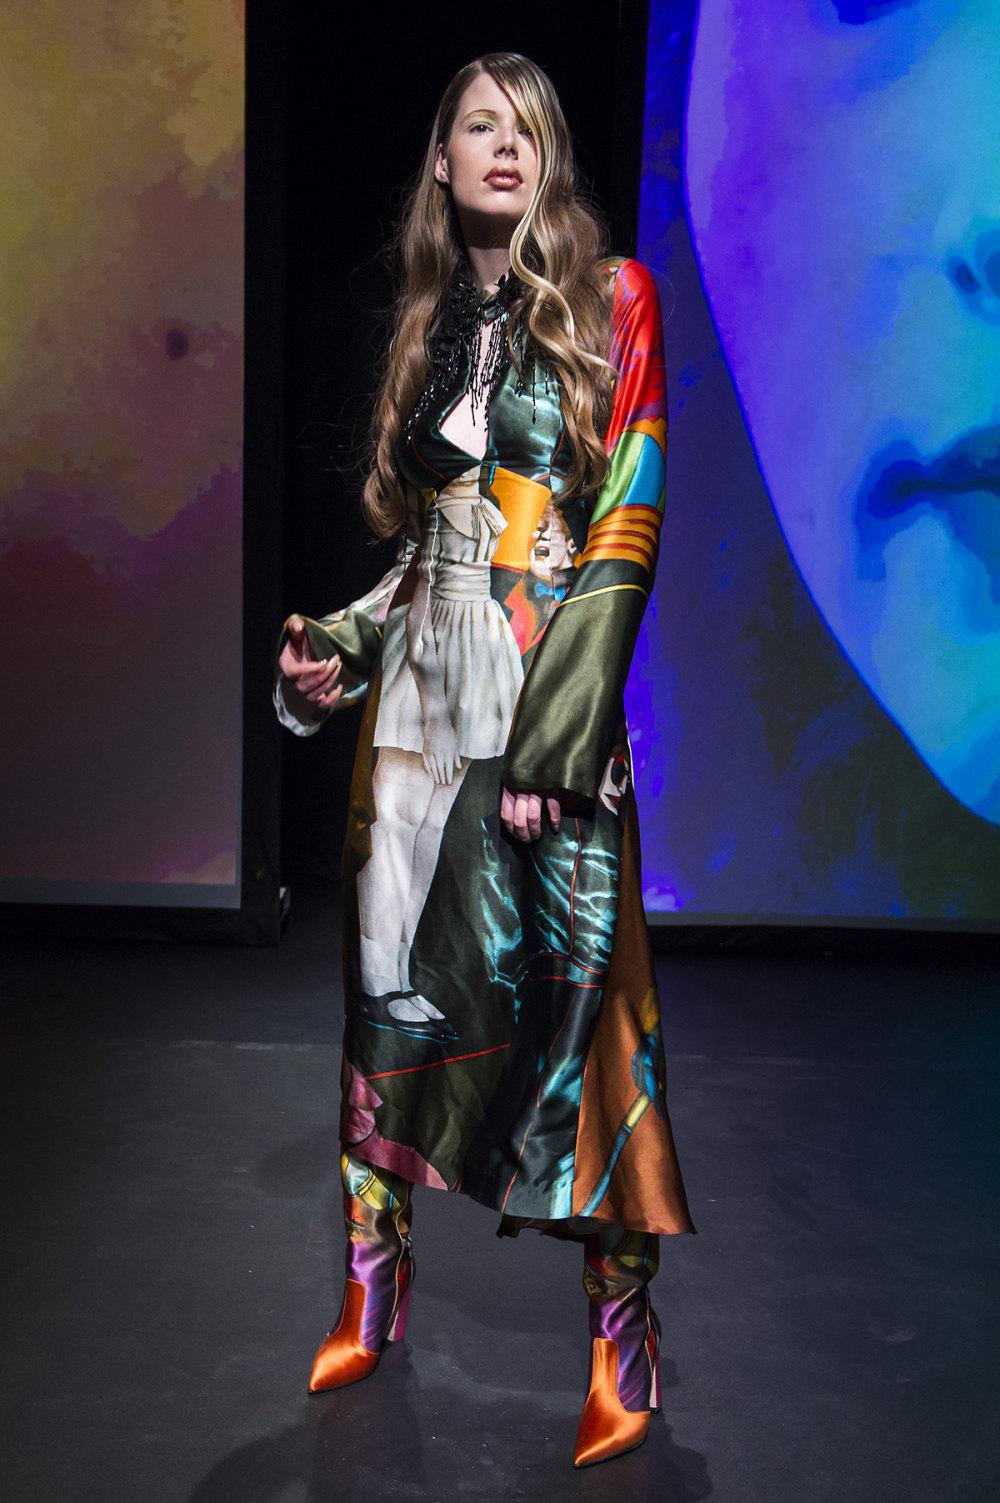 16Arlington时装系列标志性的時尚单色西装外还有更大胆的版本-17.jpg